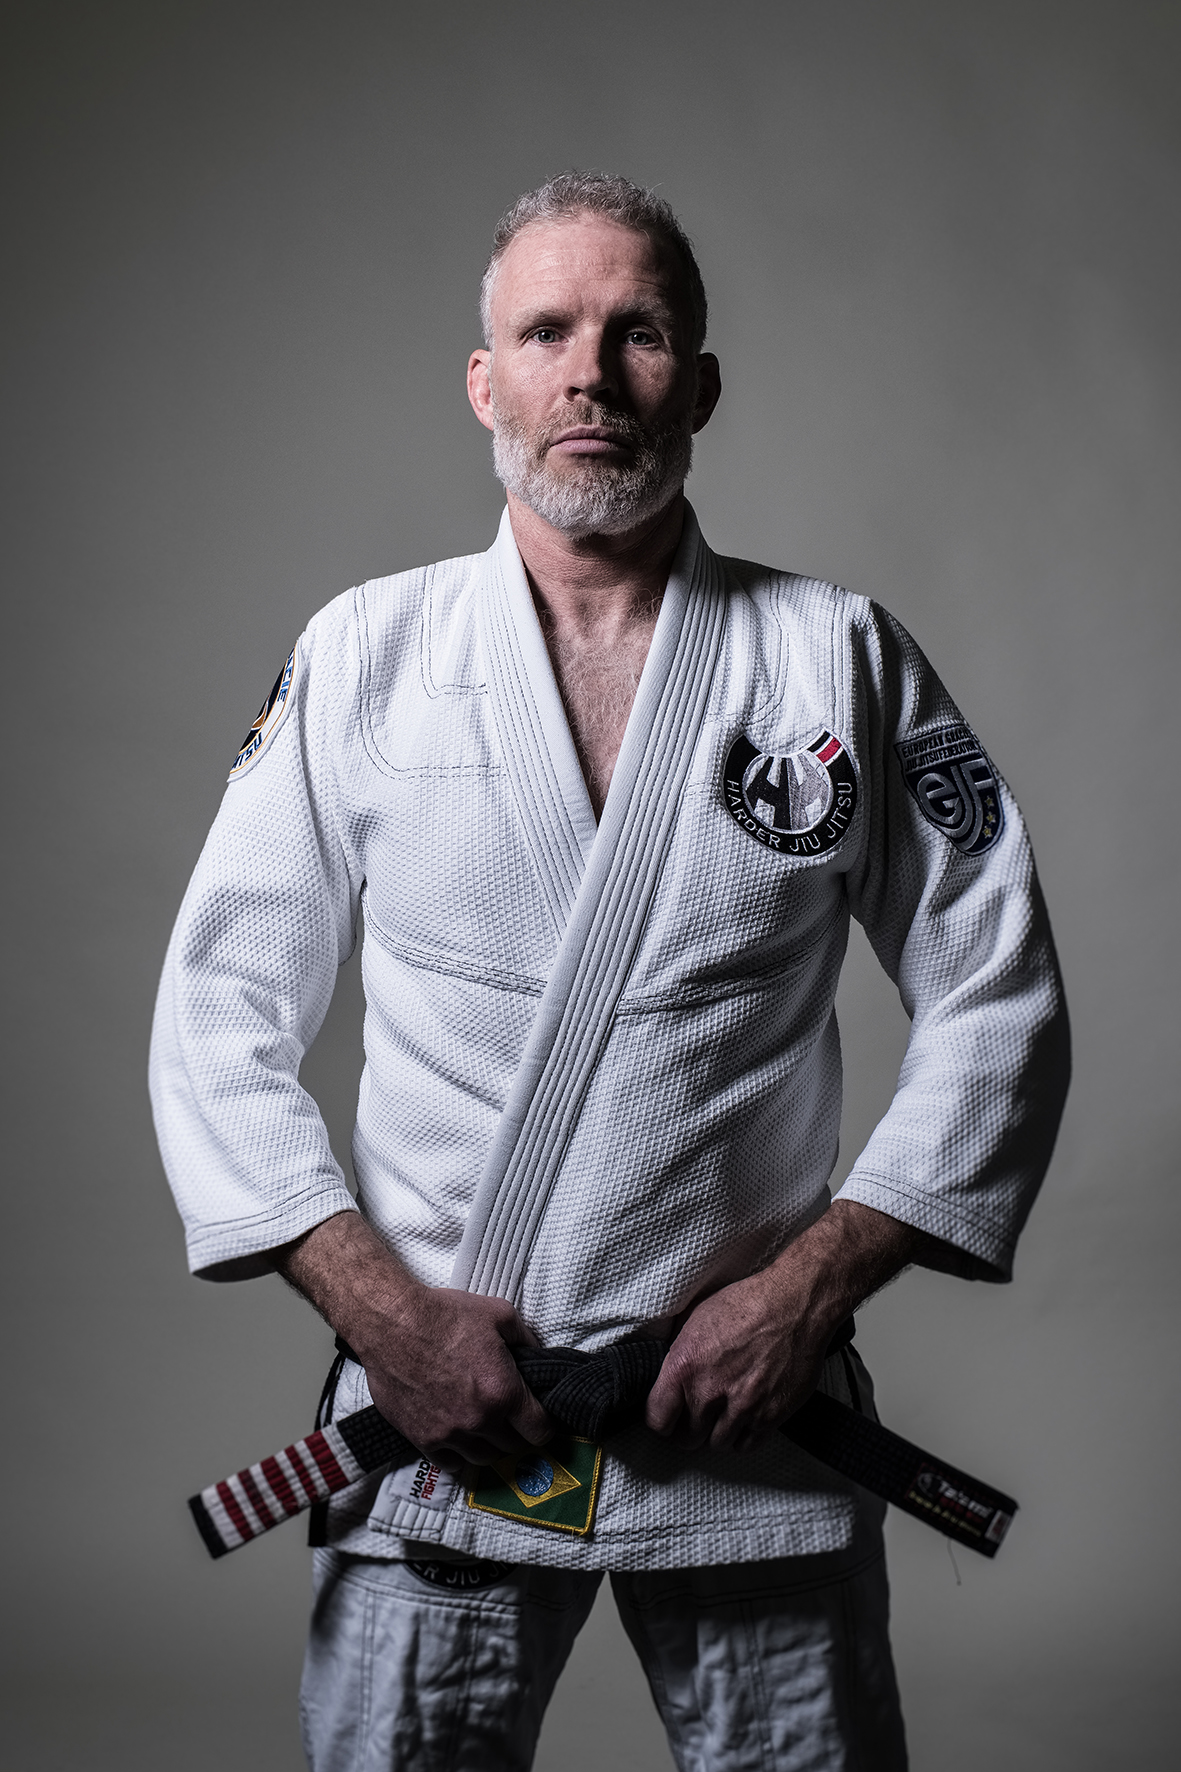 HaroldHarder_ricksongracieblackbelt_4th-degree_lineage-gracie-jiu-jitsu-gouda_LR